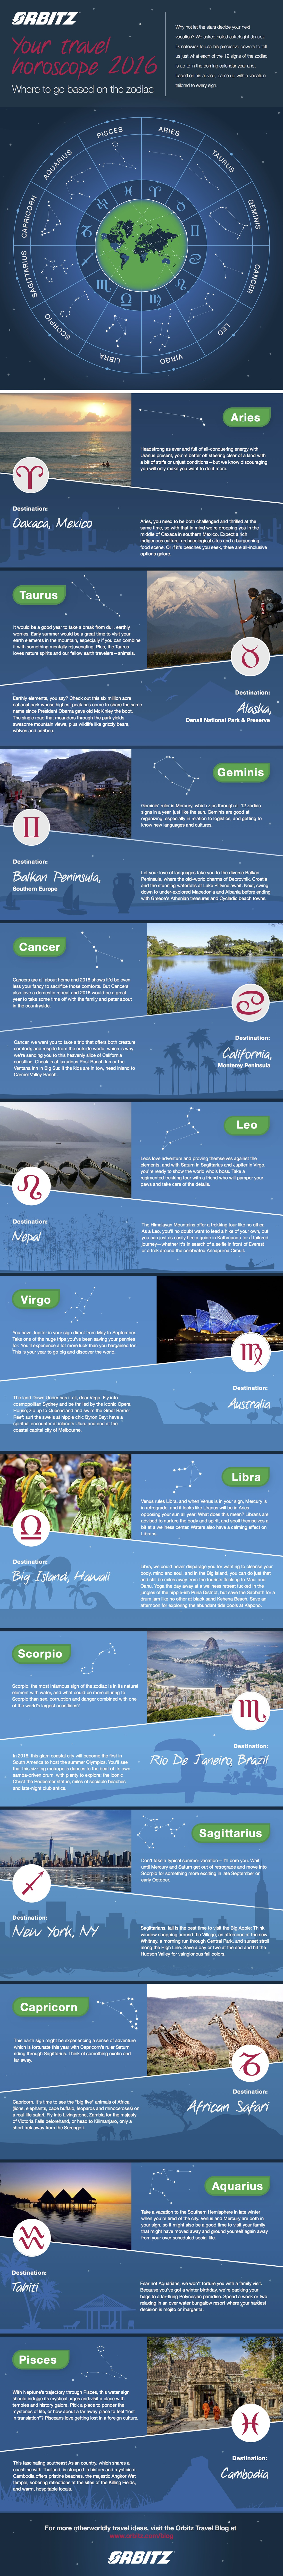 2016 Travel Horoscope